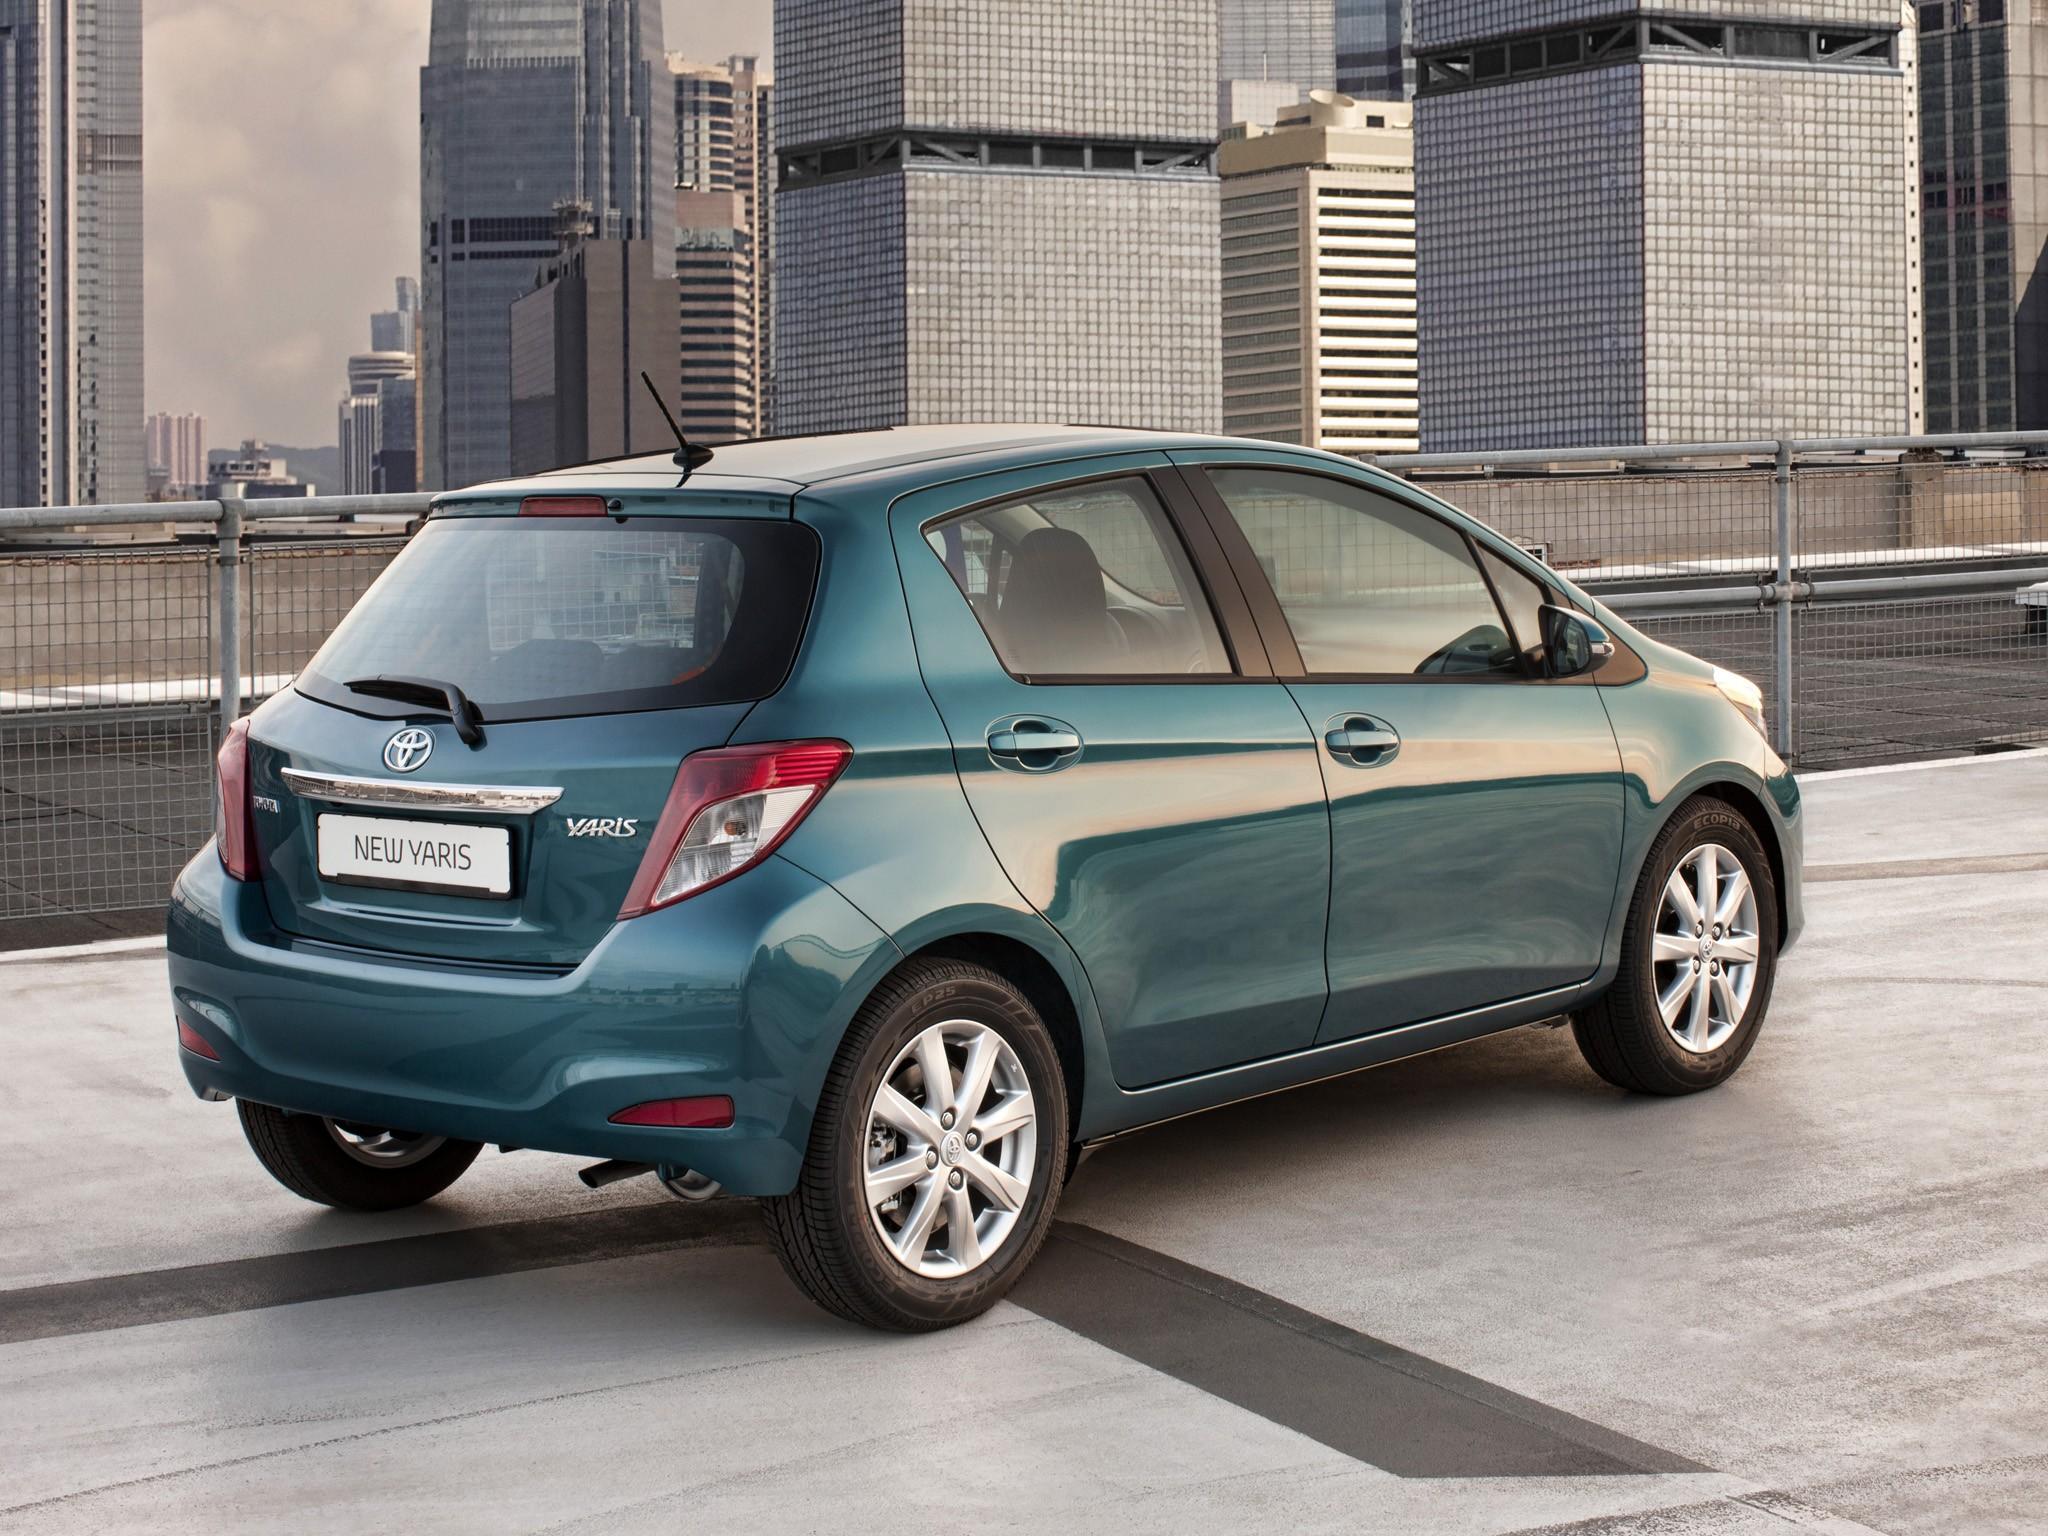 Five Star Toyota >> TOYOTA Yaris 5 Doors specs & photos - 2011, 2012, 2013, 2014 - autoevolution